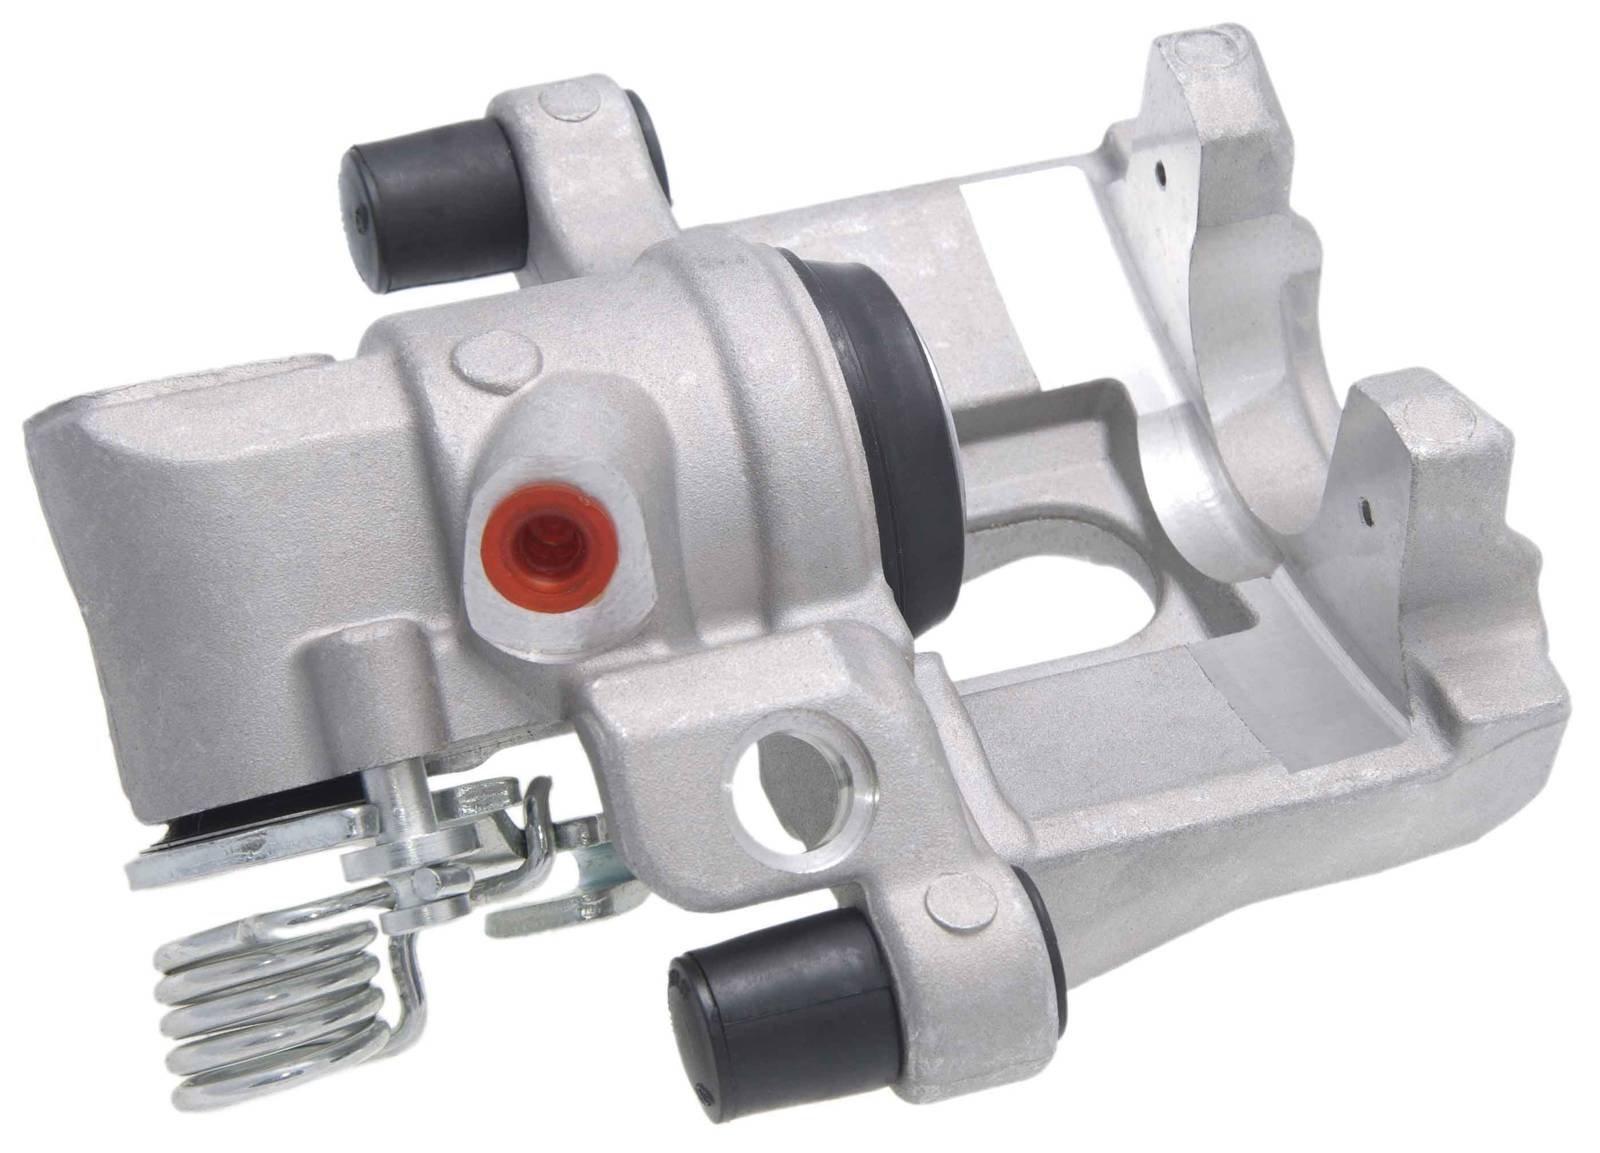 Bpyk2661Xc - Brake Caliper (Rear Right) For Mazda - Febest by Febest